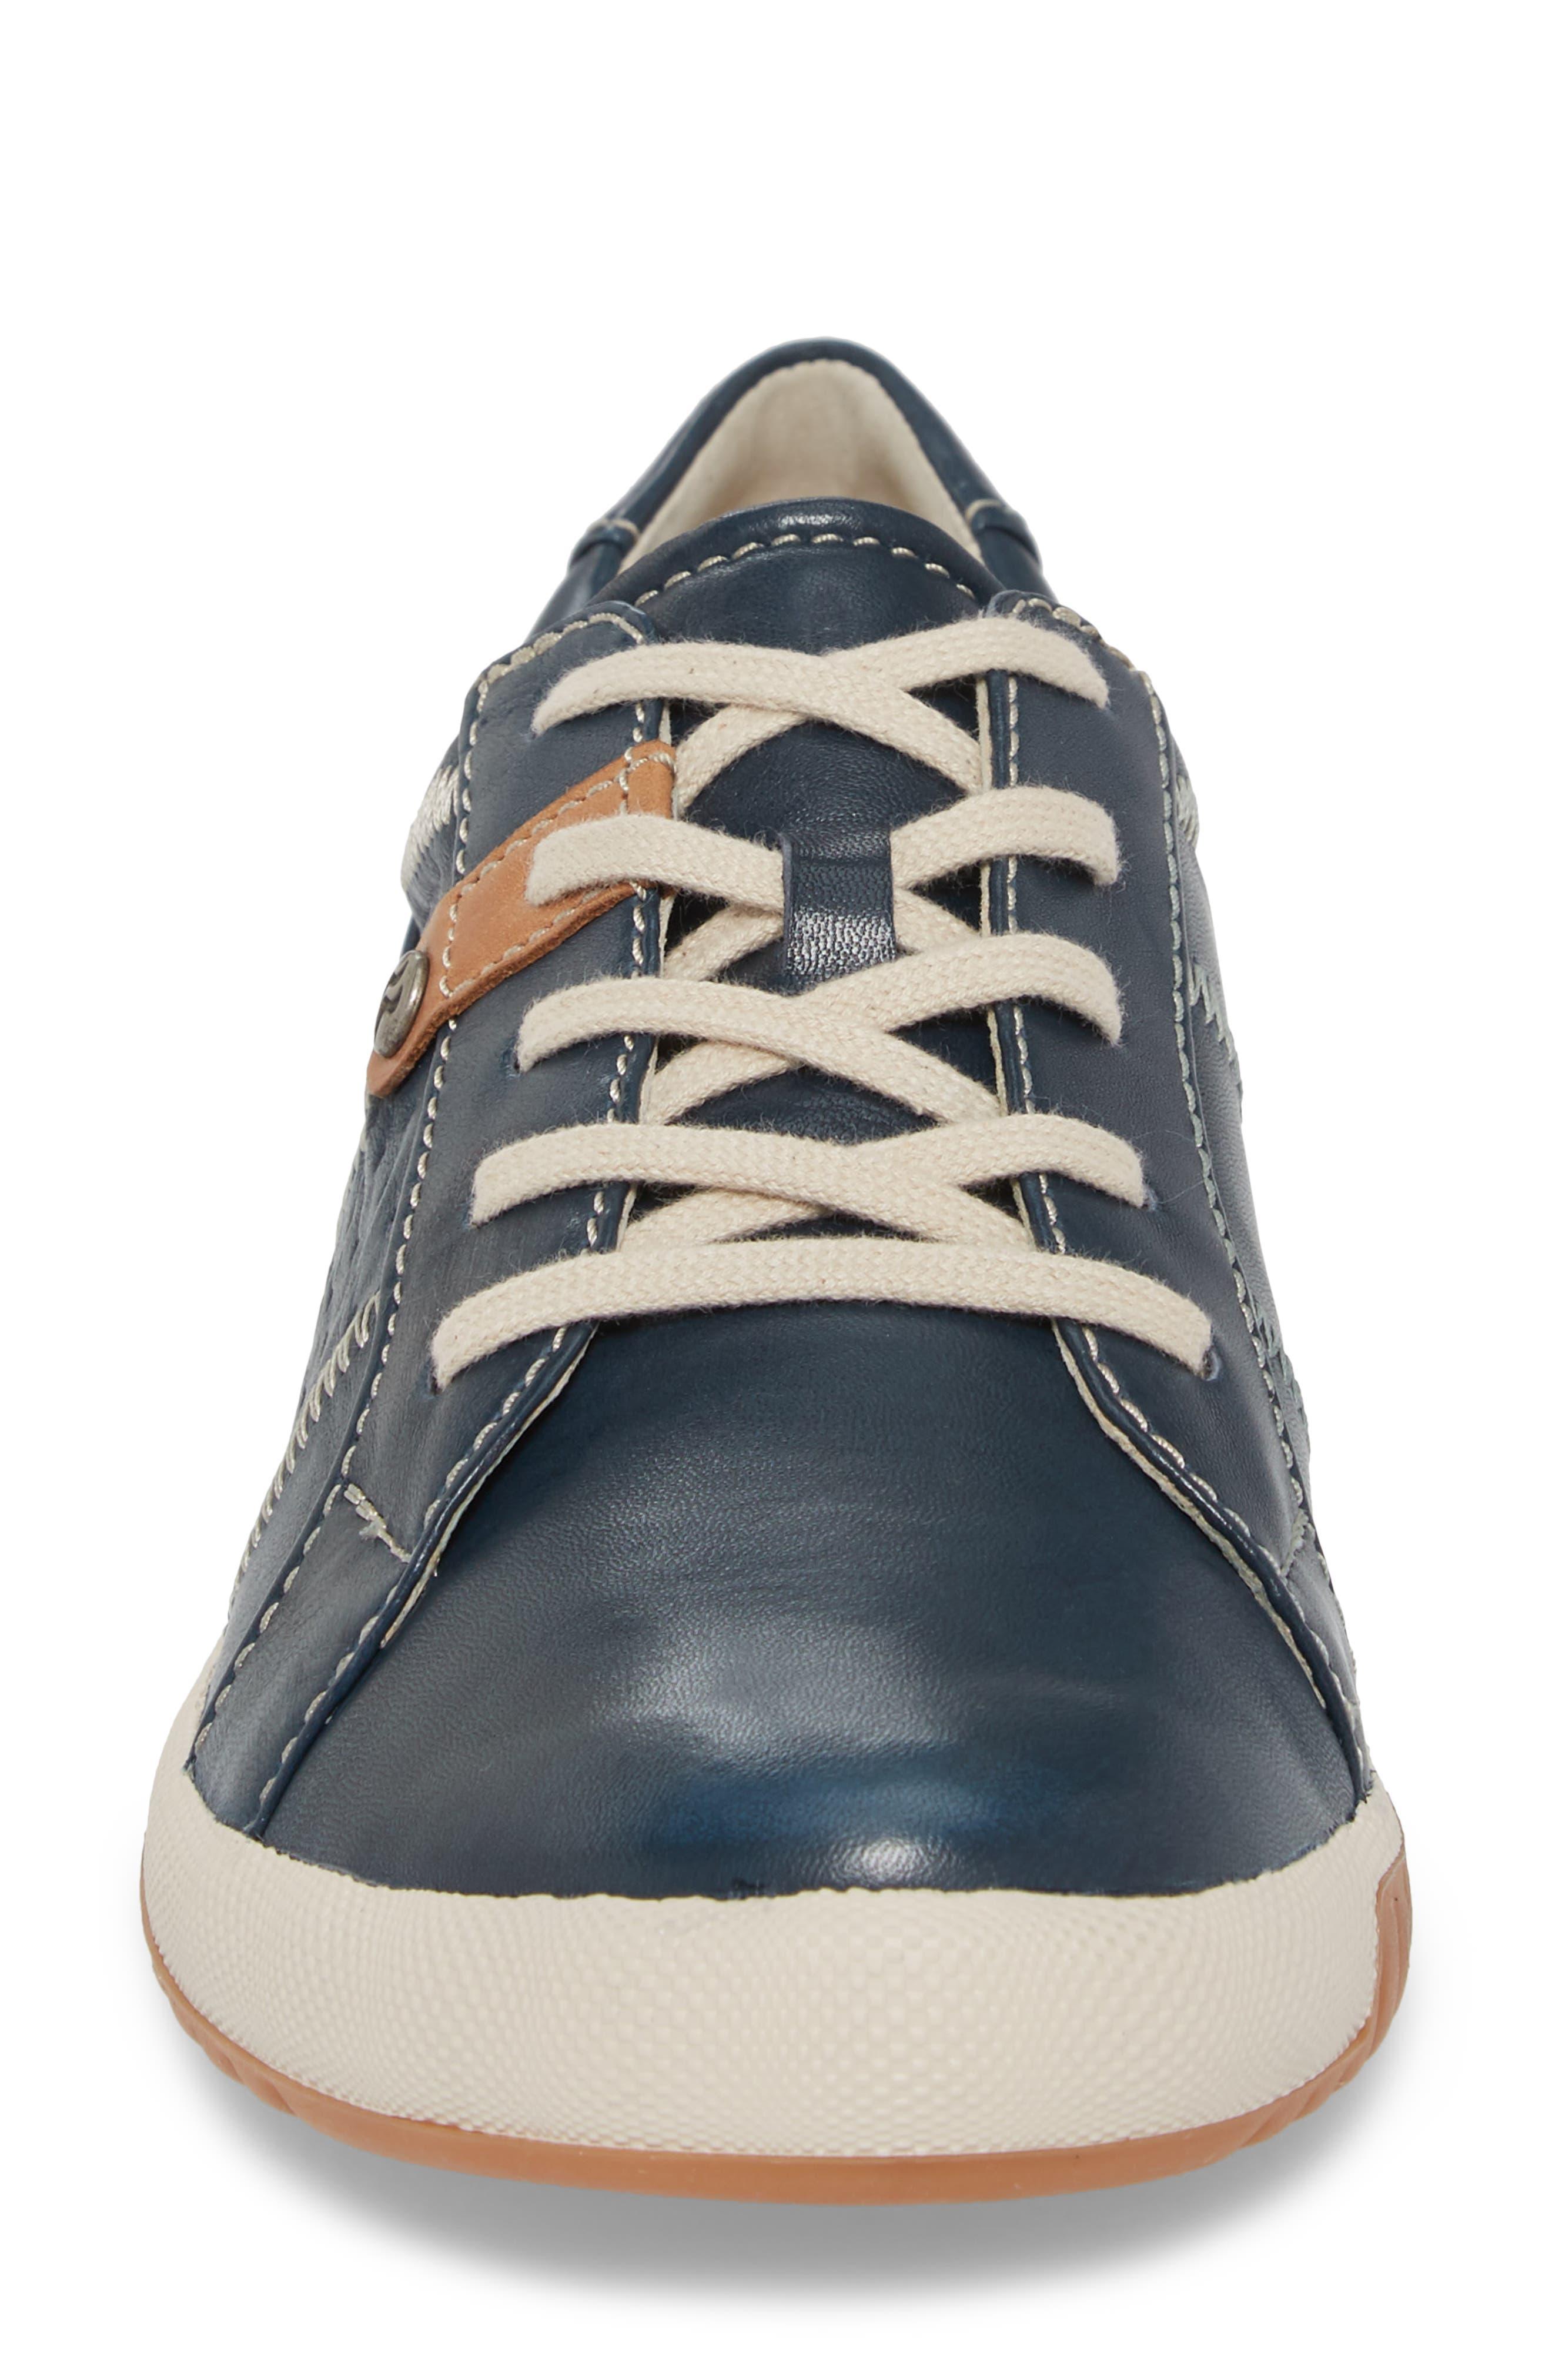 Cordoba 01 Sneaker,                             Alternate thumbnail 4, color,                             OCEAN LEATHER